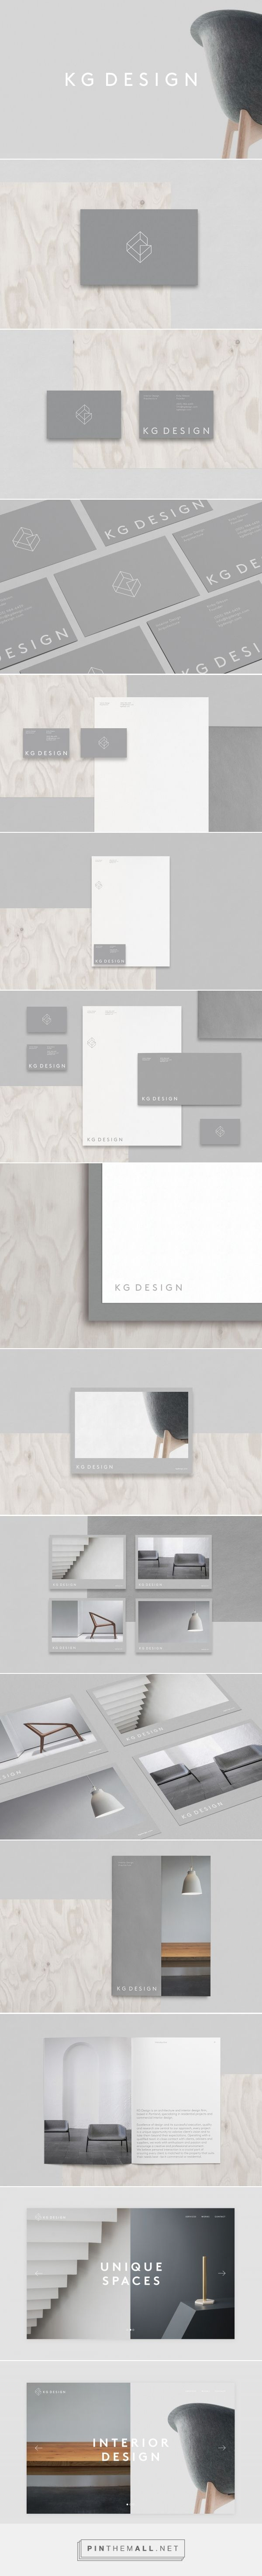 KG Design Interior Design and Arquitecture Firm Branding by Sonia Castillo   Fivestar Branding Agency – Design and Branding Agency & Curated Inspiration Gallery